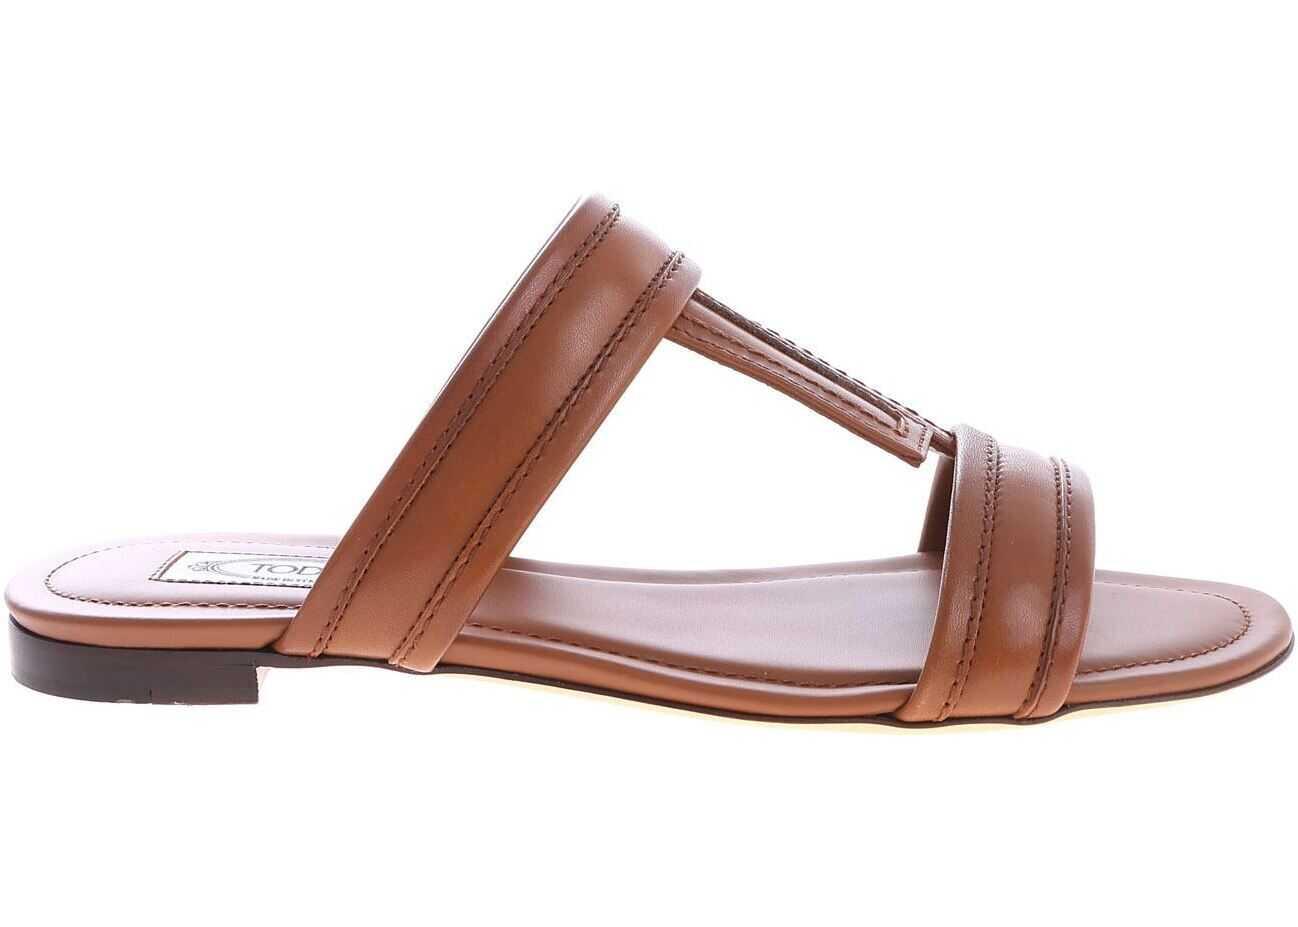 Tan Leather Slides